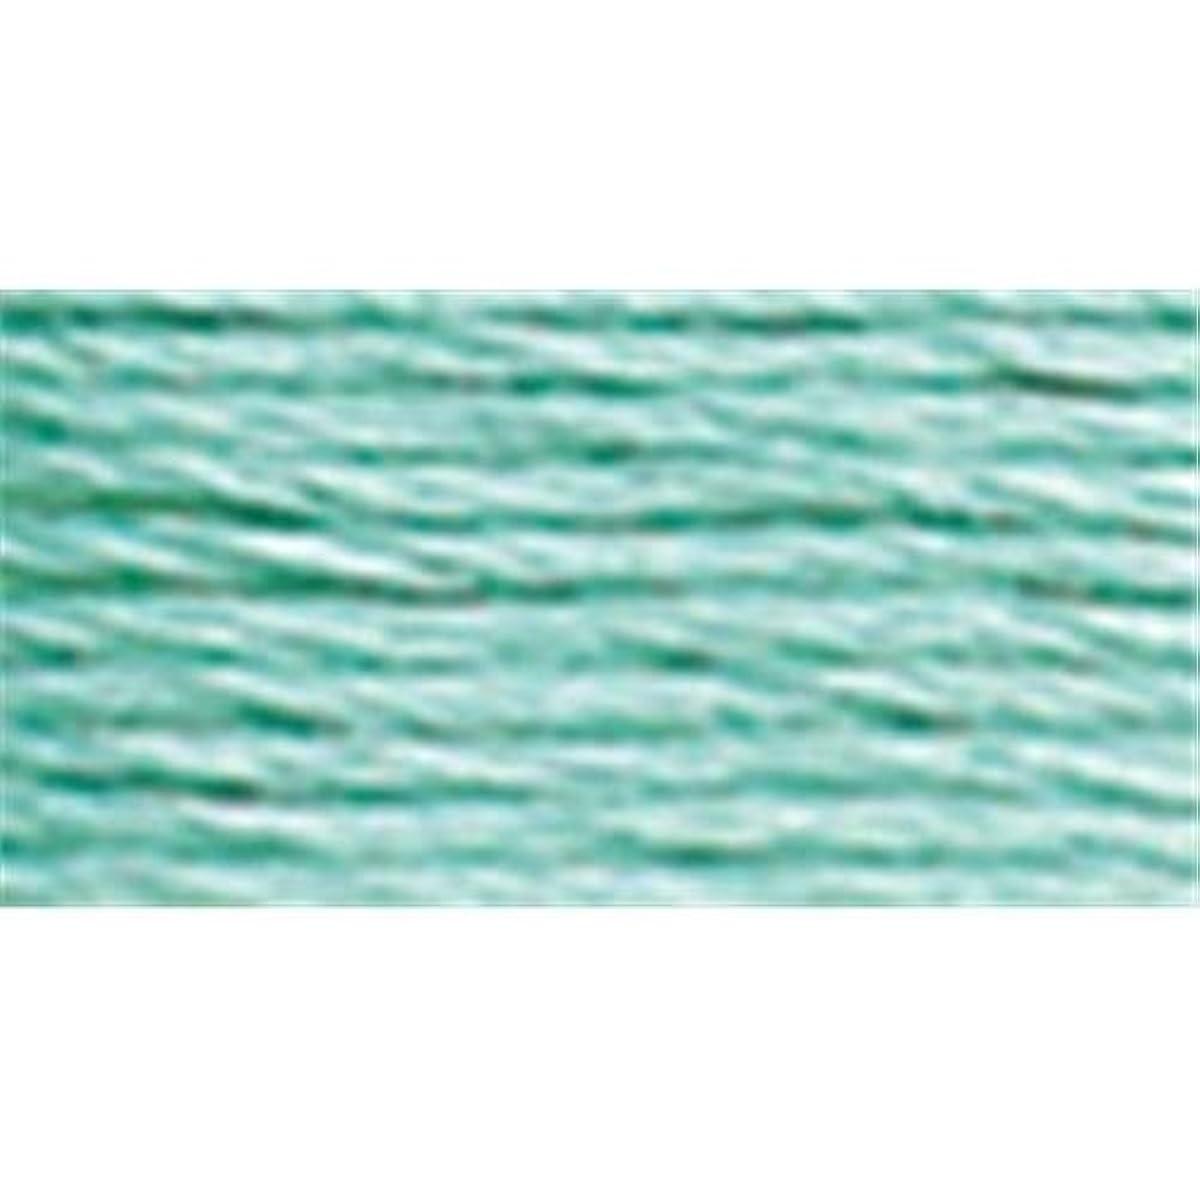 DMC 117-964 6 Strand Embroidery Cotton Floss, Light Seagreen, 8.7-Yard